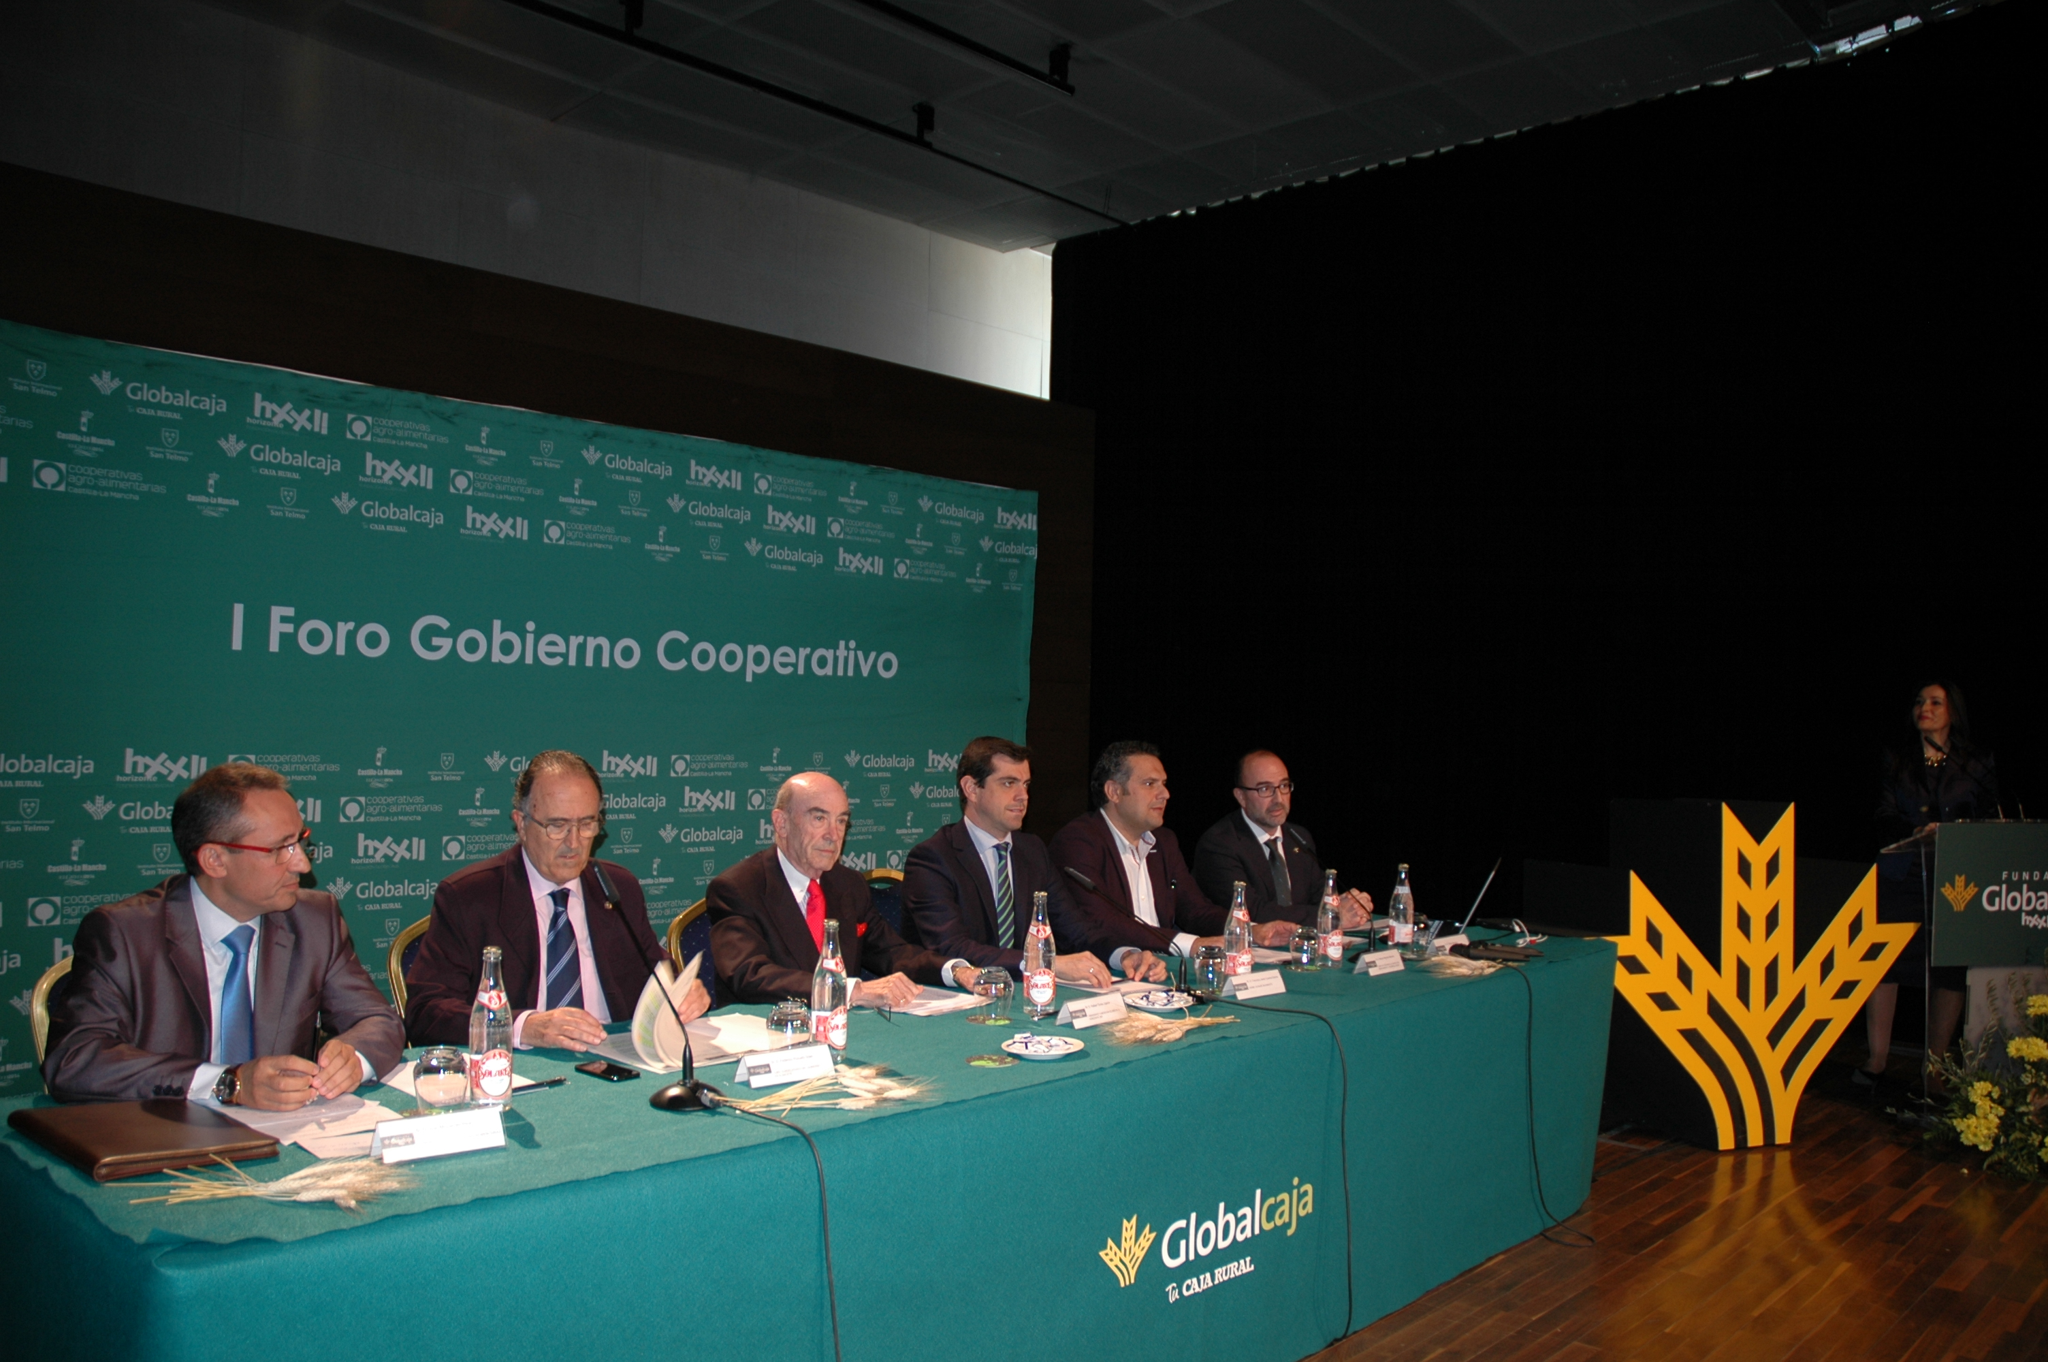 https://blog.globalcaja.es/wp-content/uploads/2015/11/Foro-Albacete-mesa.jpg